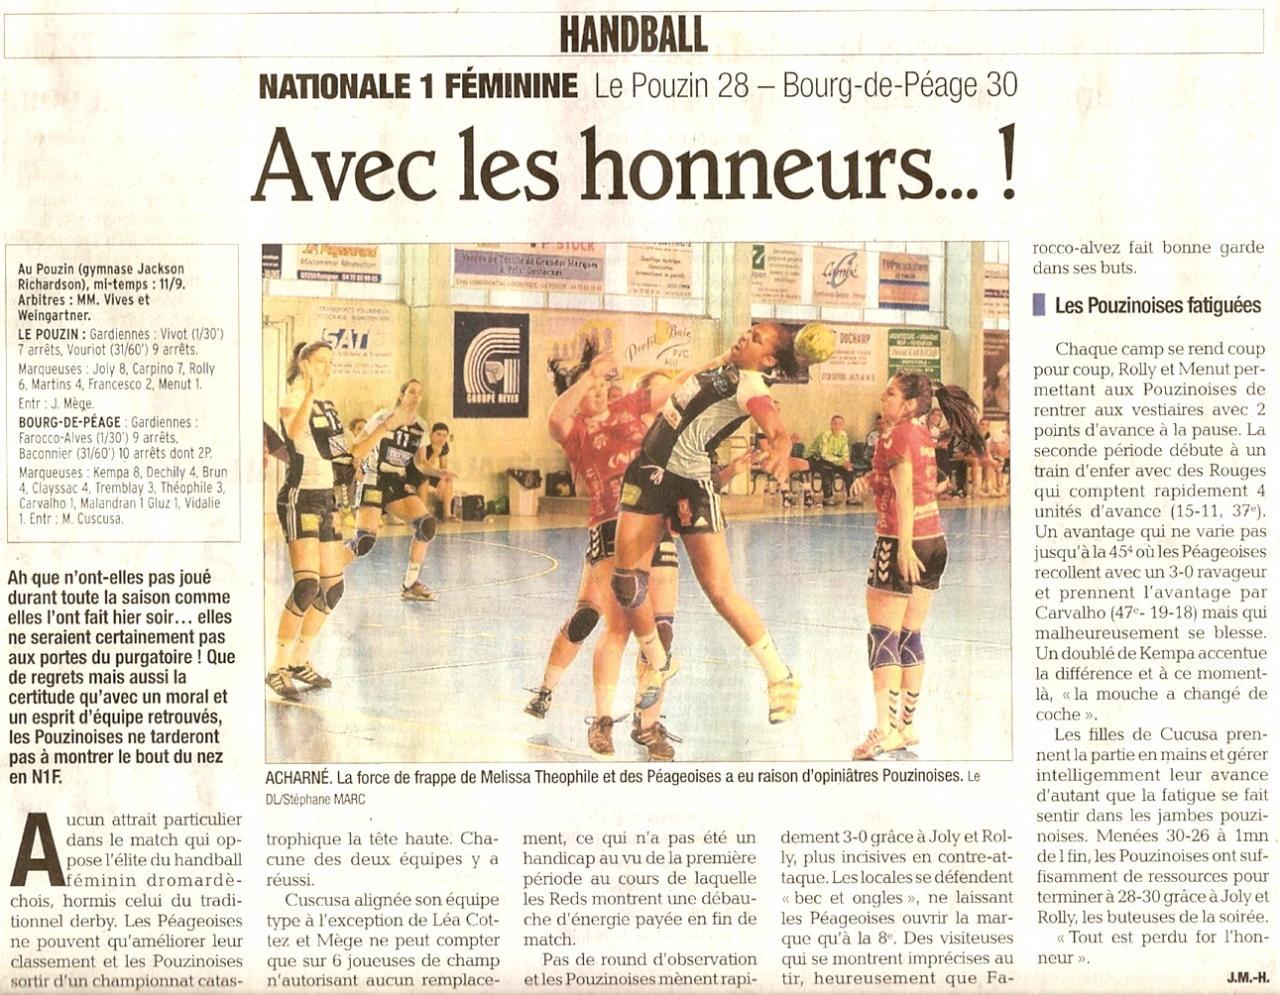 dl-sports-13-05-2012.jpg